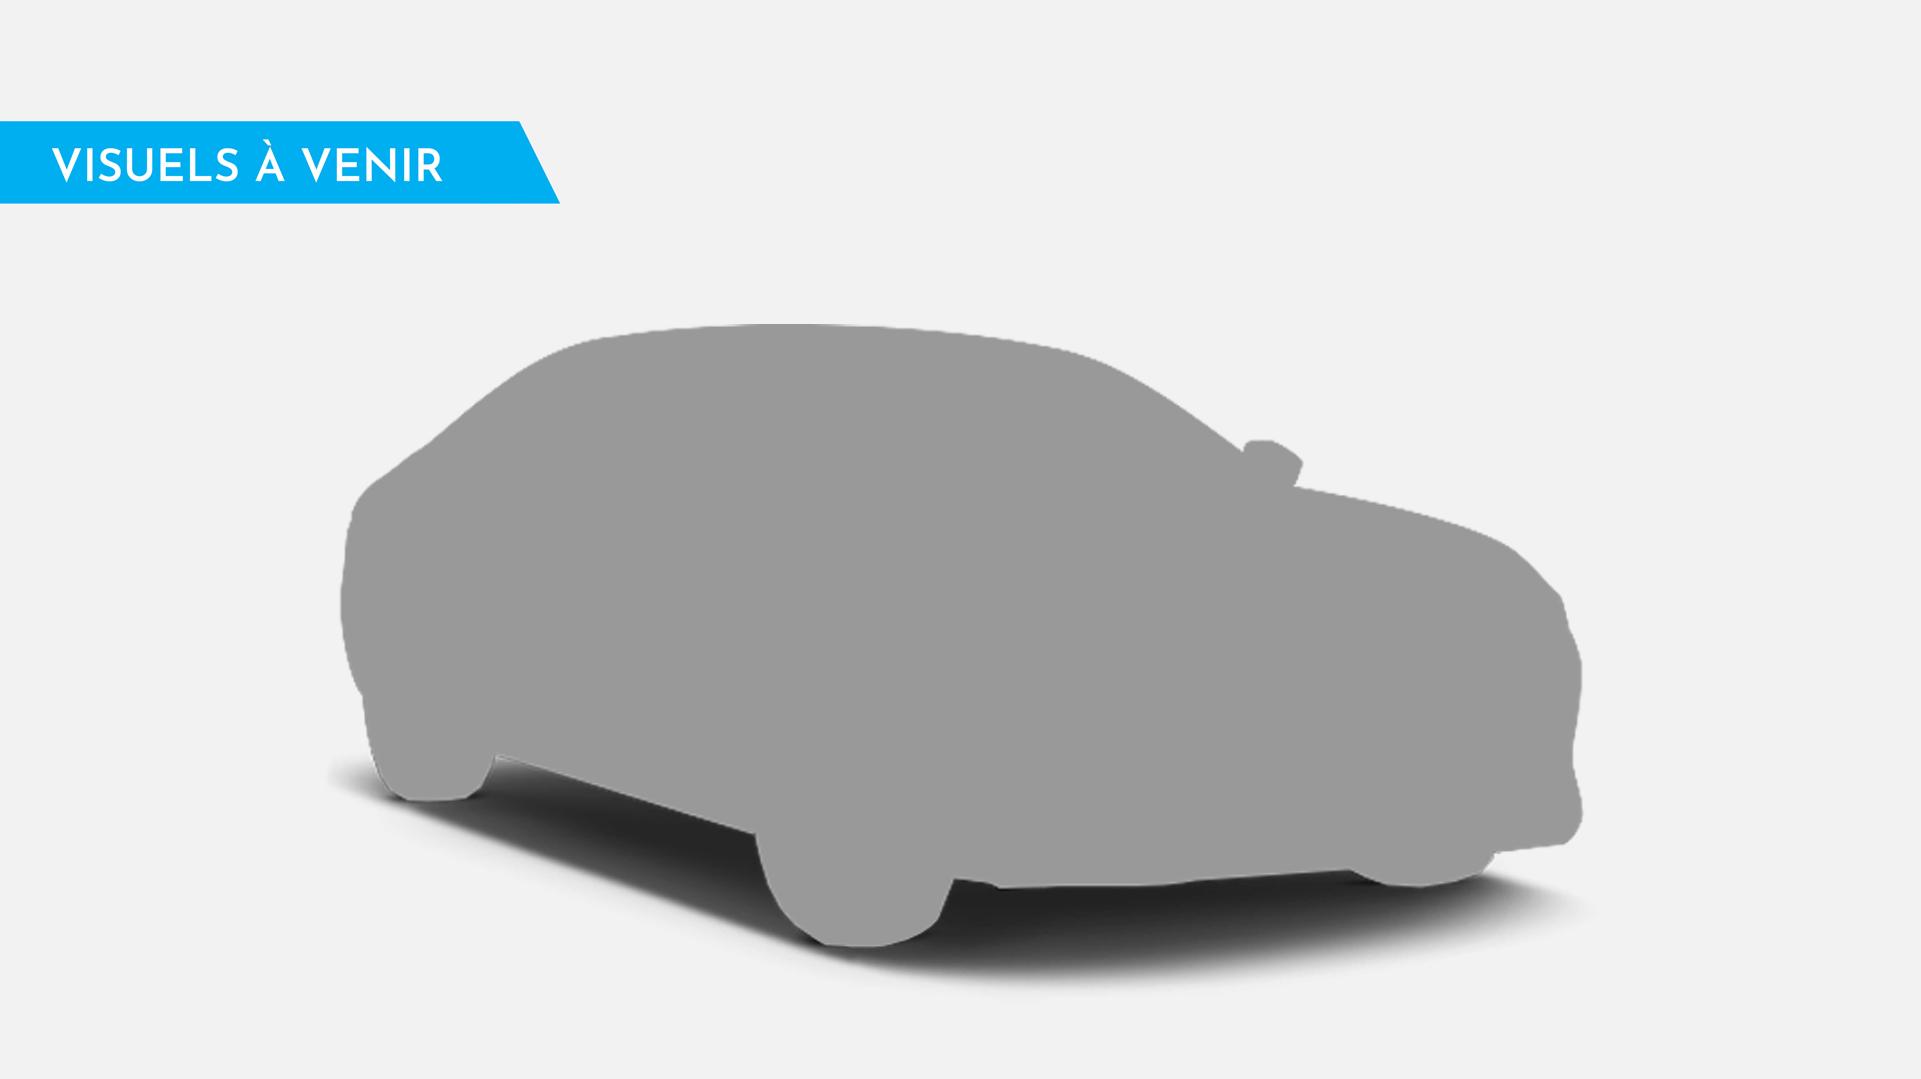 Hyundai tucson 1 7 crdi 115 creative 2wd occasion lyon for Interieur hyundai tucson